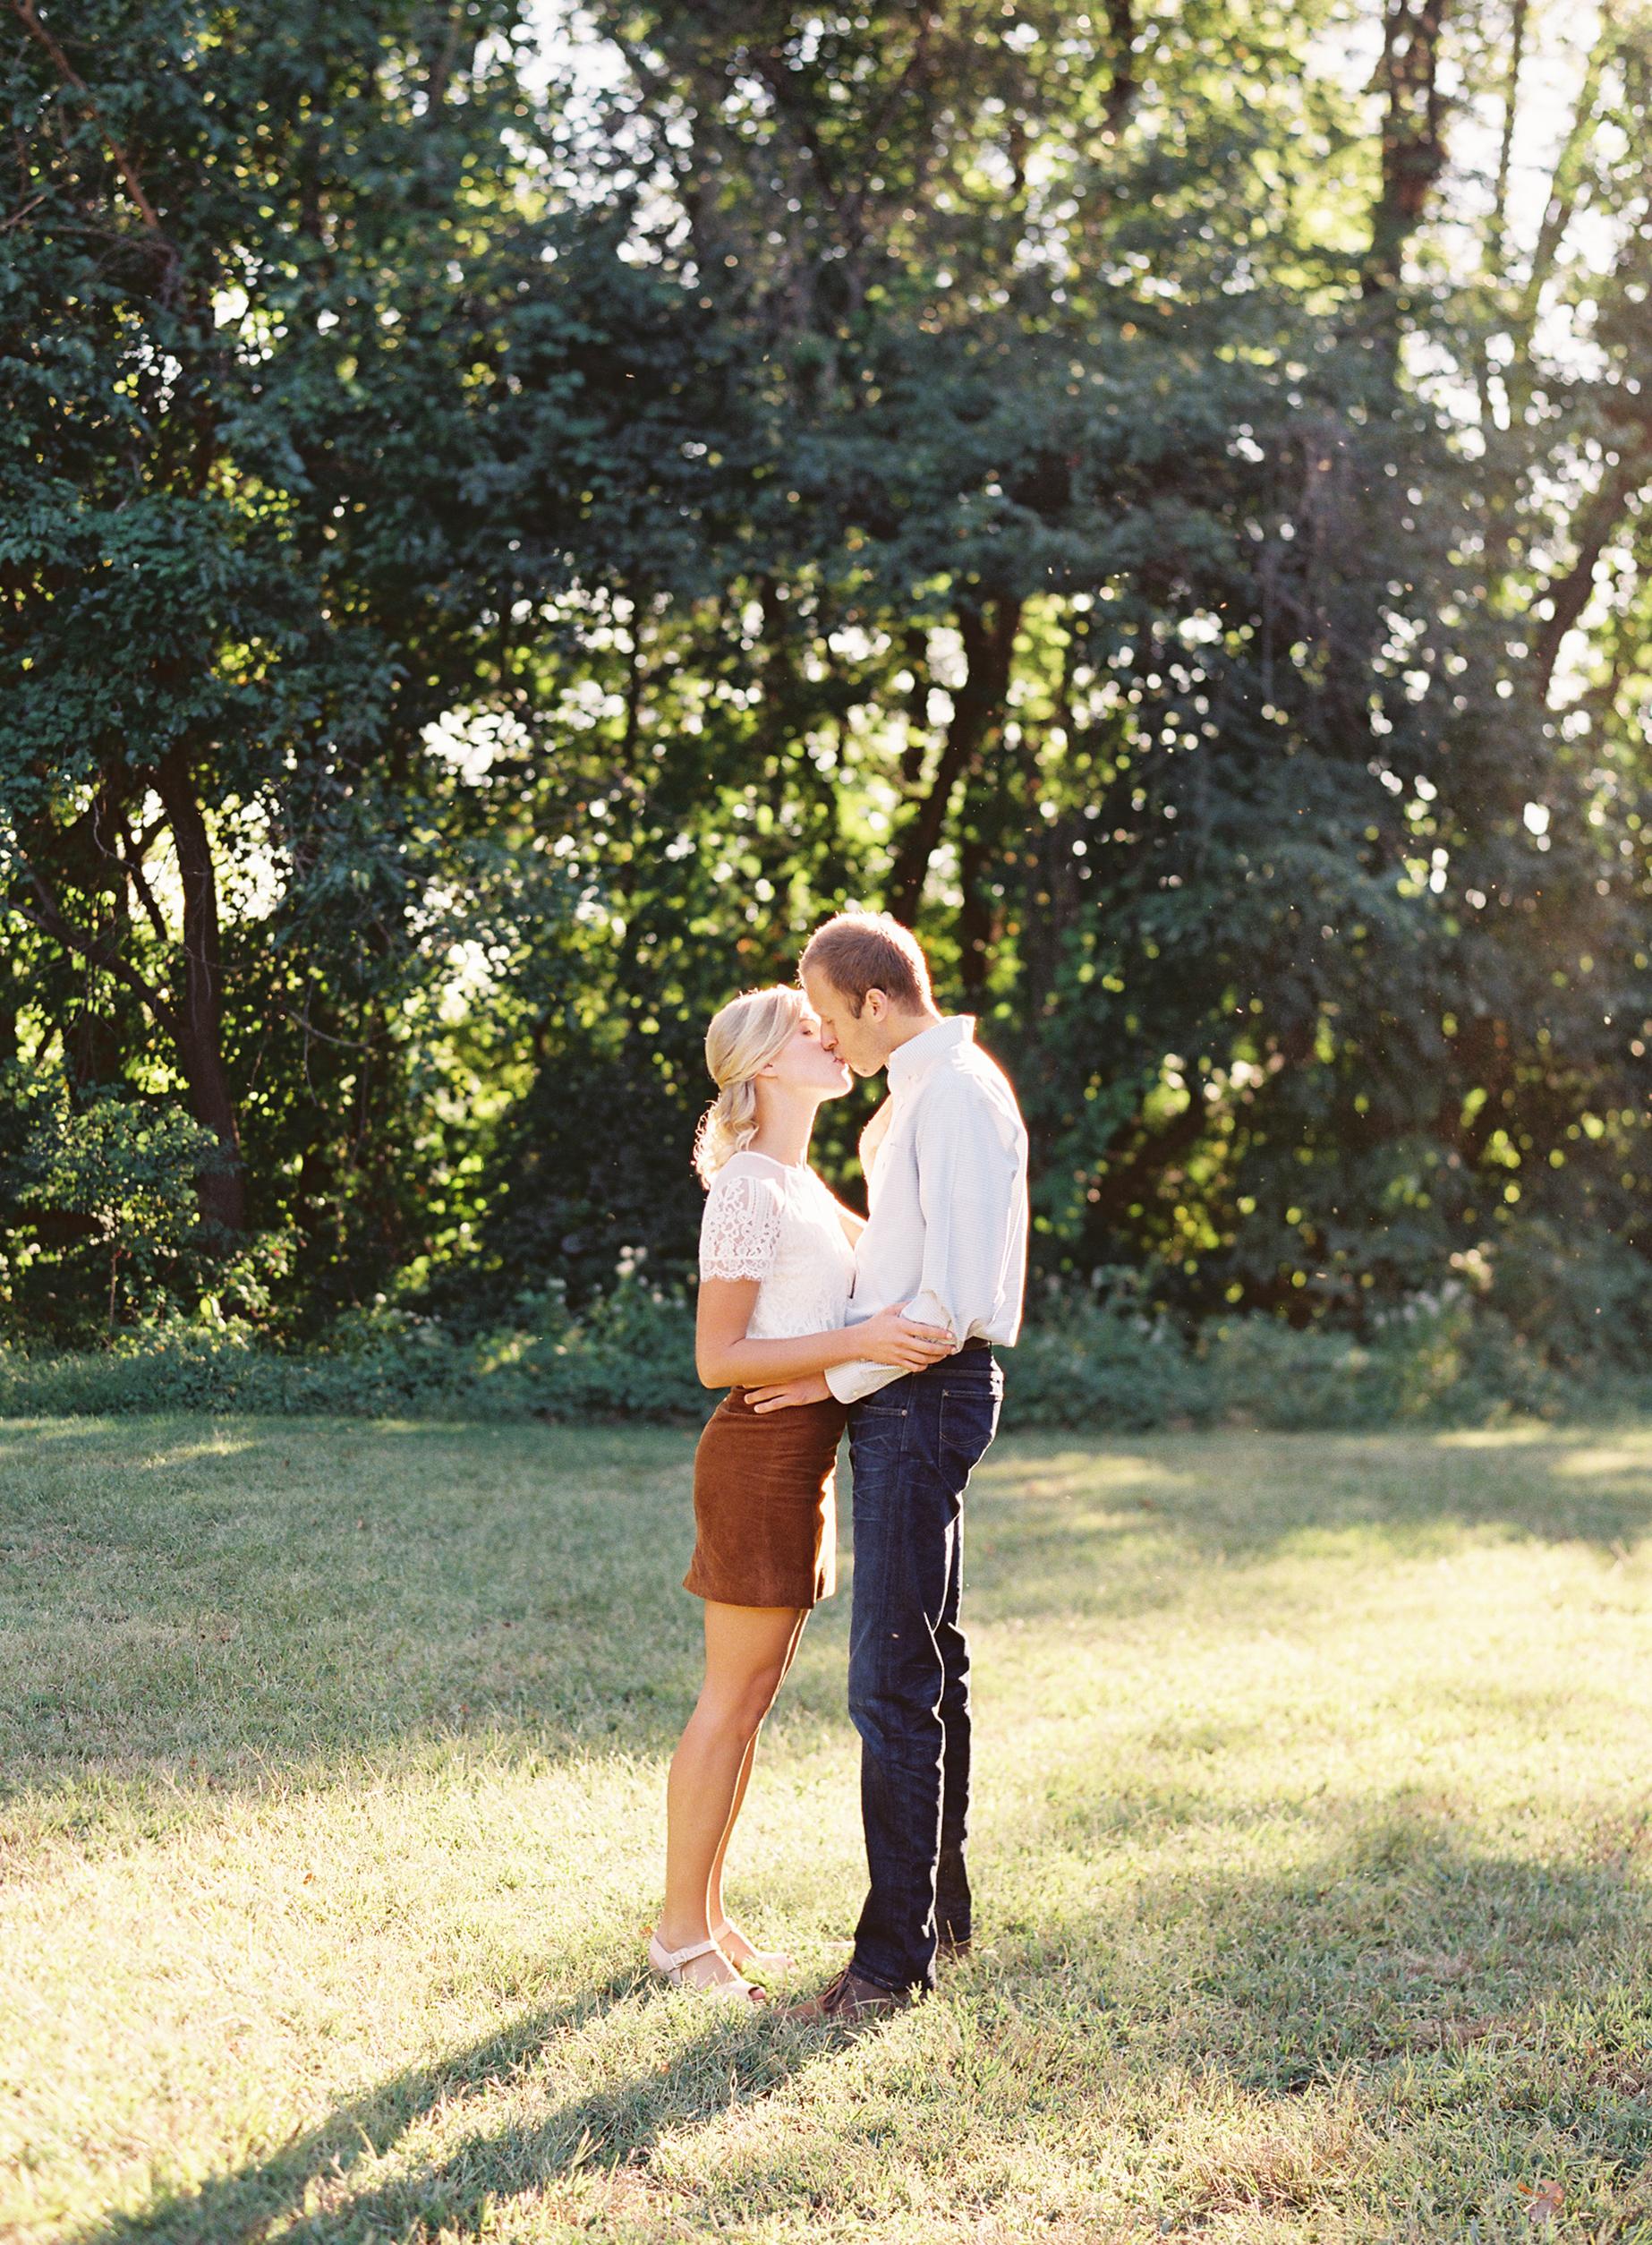 Meghan Mehan Photography | Fine Art Film Wedding Photographer | California | San Francisco | Napa | Sonoma | Santa Barbara | Big Sur | Los Angeles | Destination Wedding Photographer 004.jpg